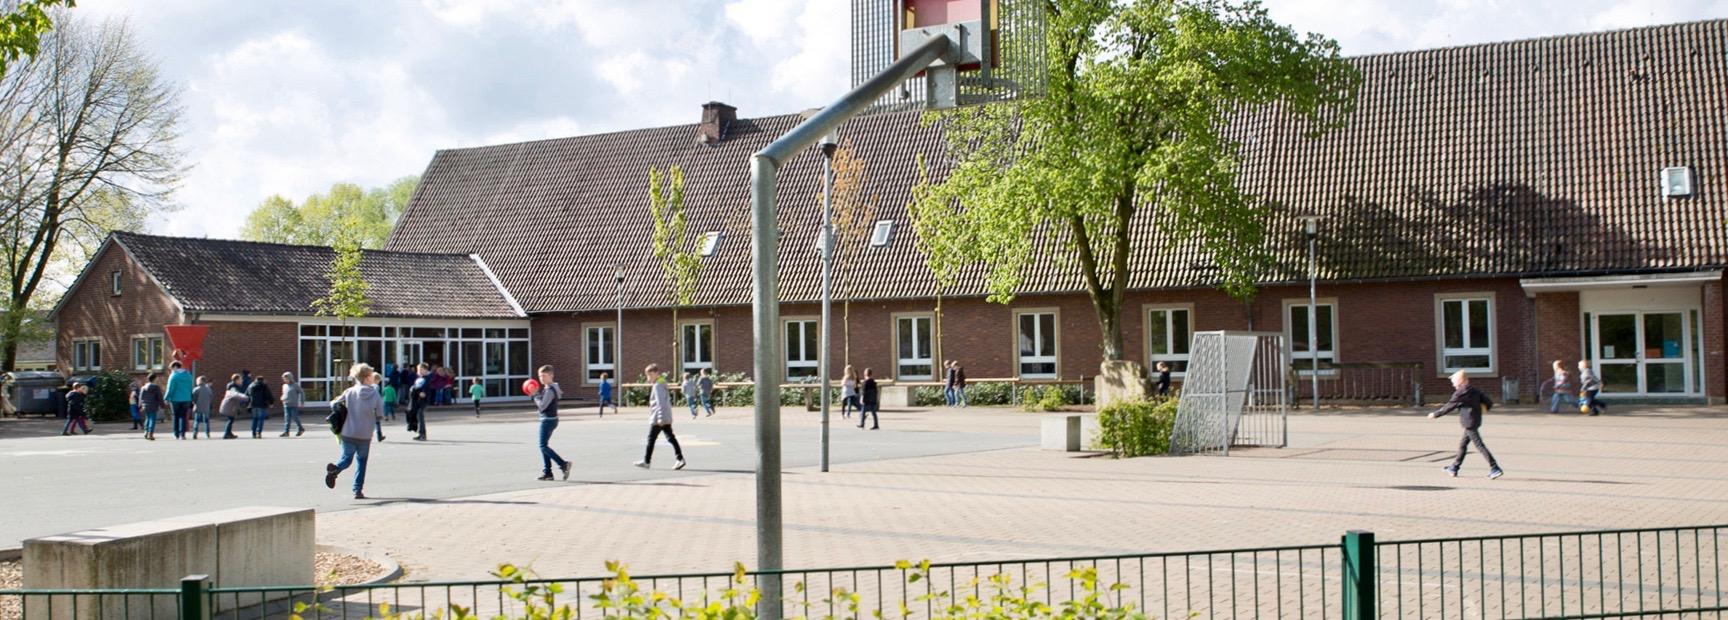 St.-Antonius-Grundschule